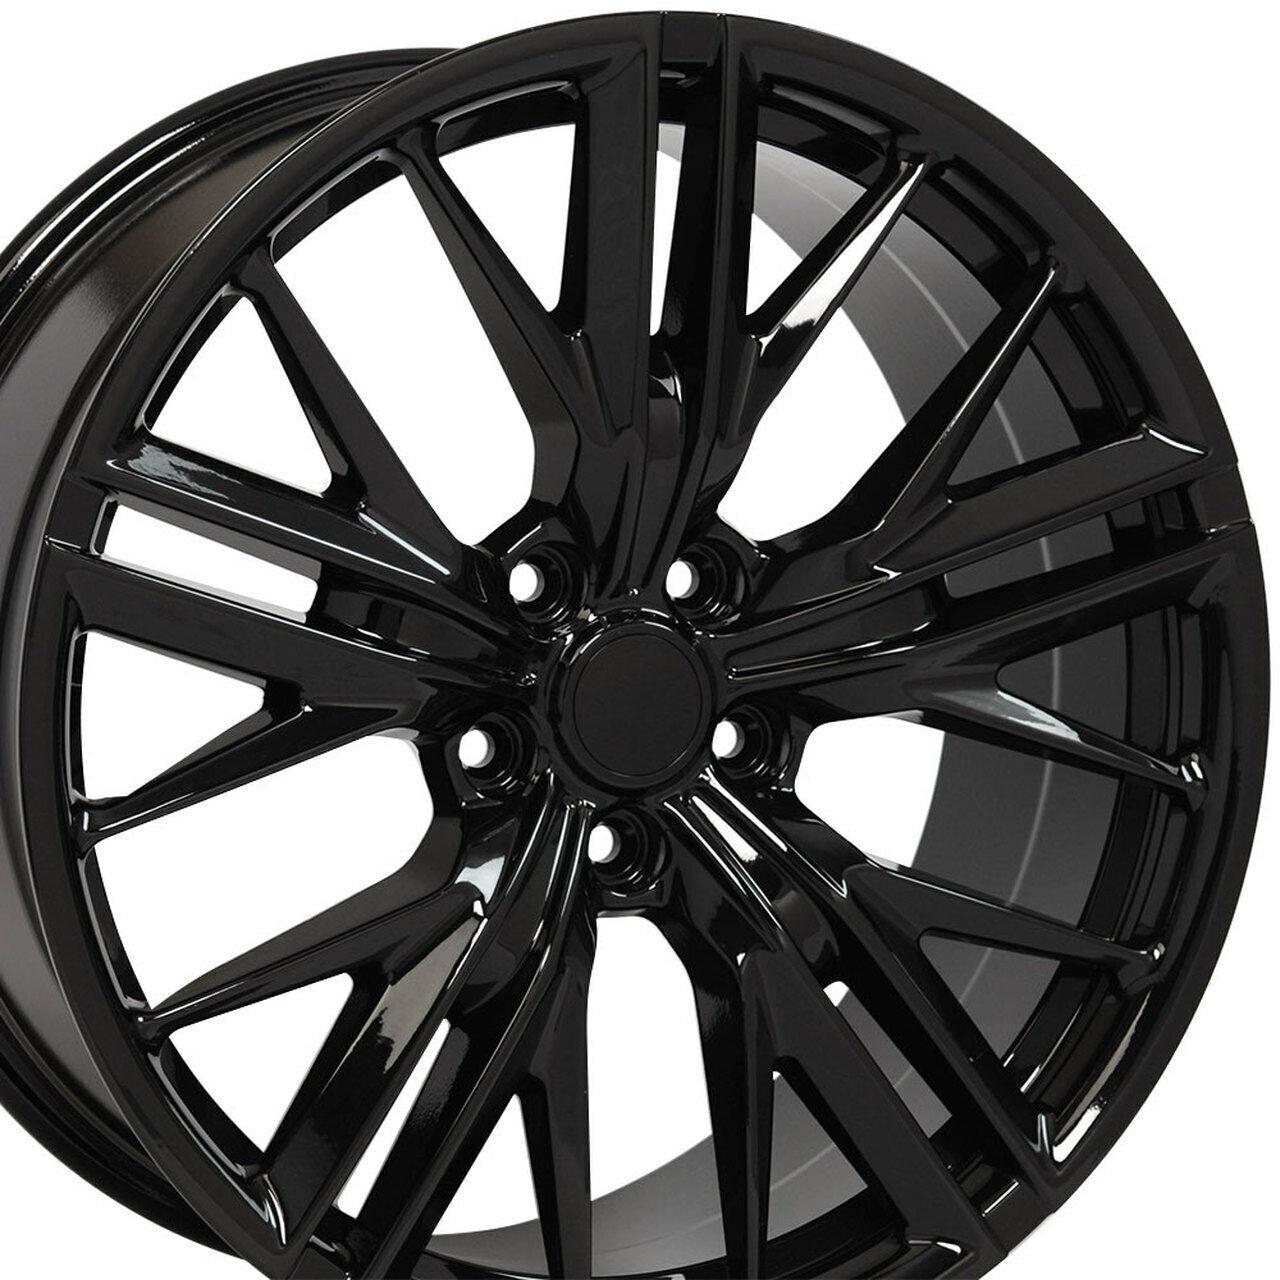 ::20 Gloss Black Wheels 20x10 +23 / 20x11 +43 Fit Chevrolet Camaro Chevy Set 4